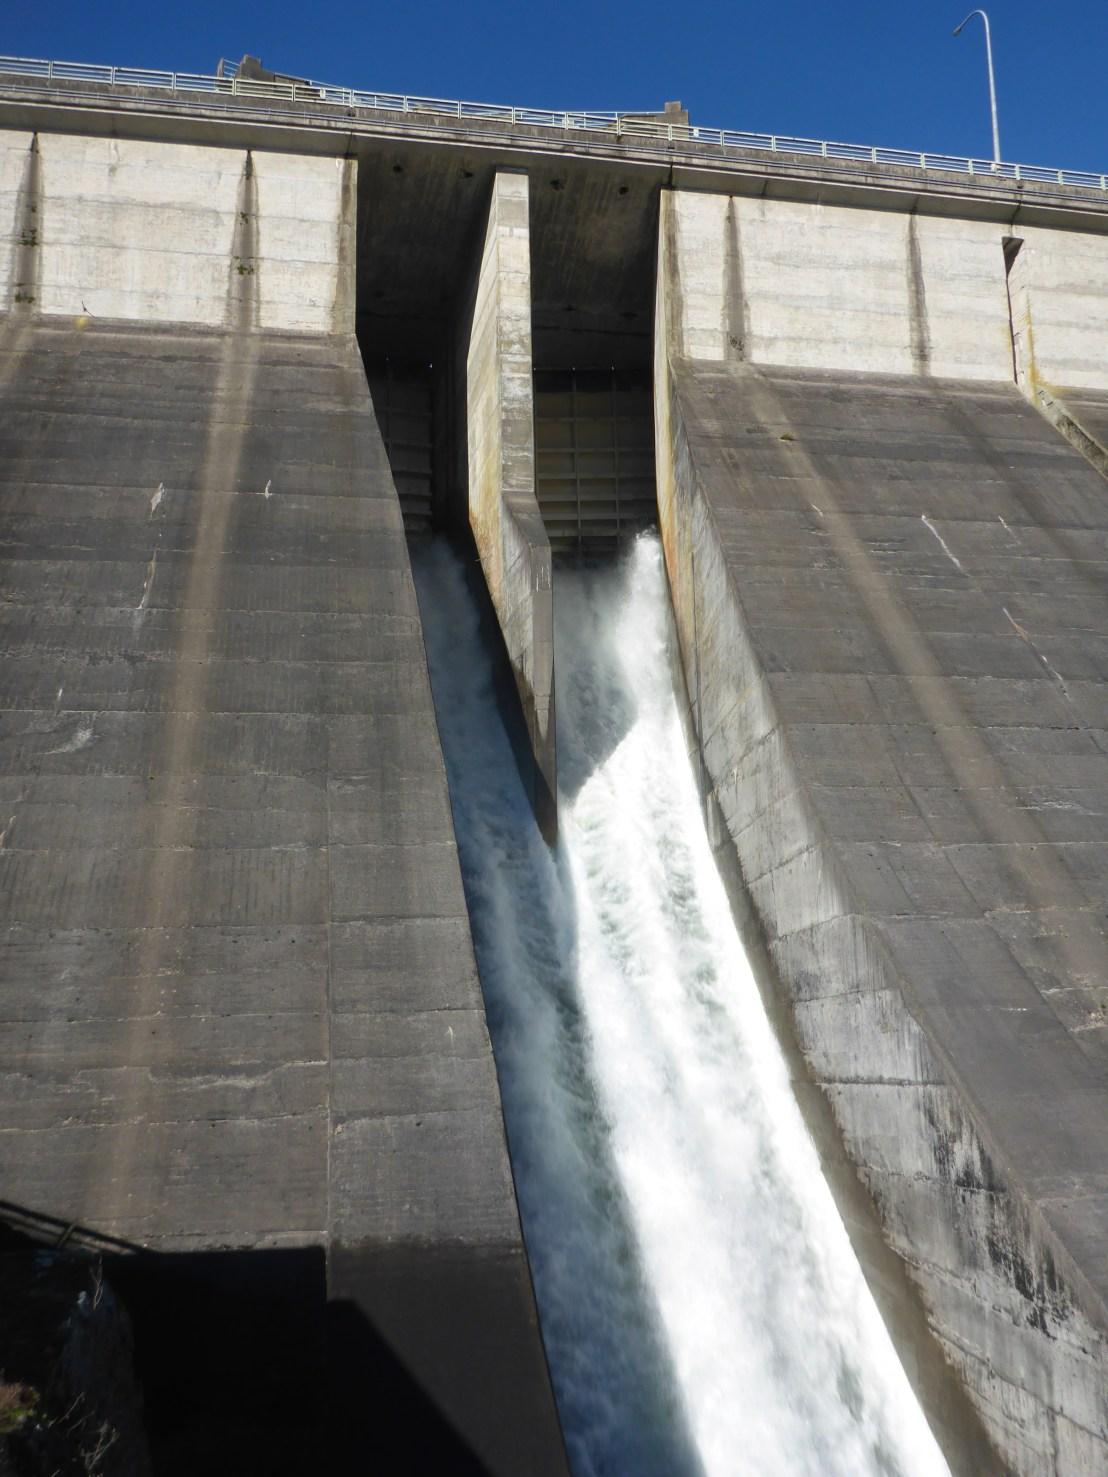 Whakamaru Dam | Mercury | Hydropower | Danny Bardsley